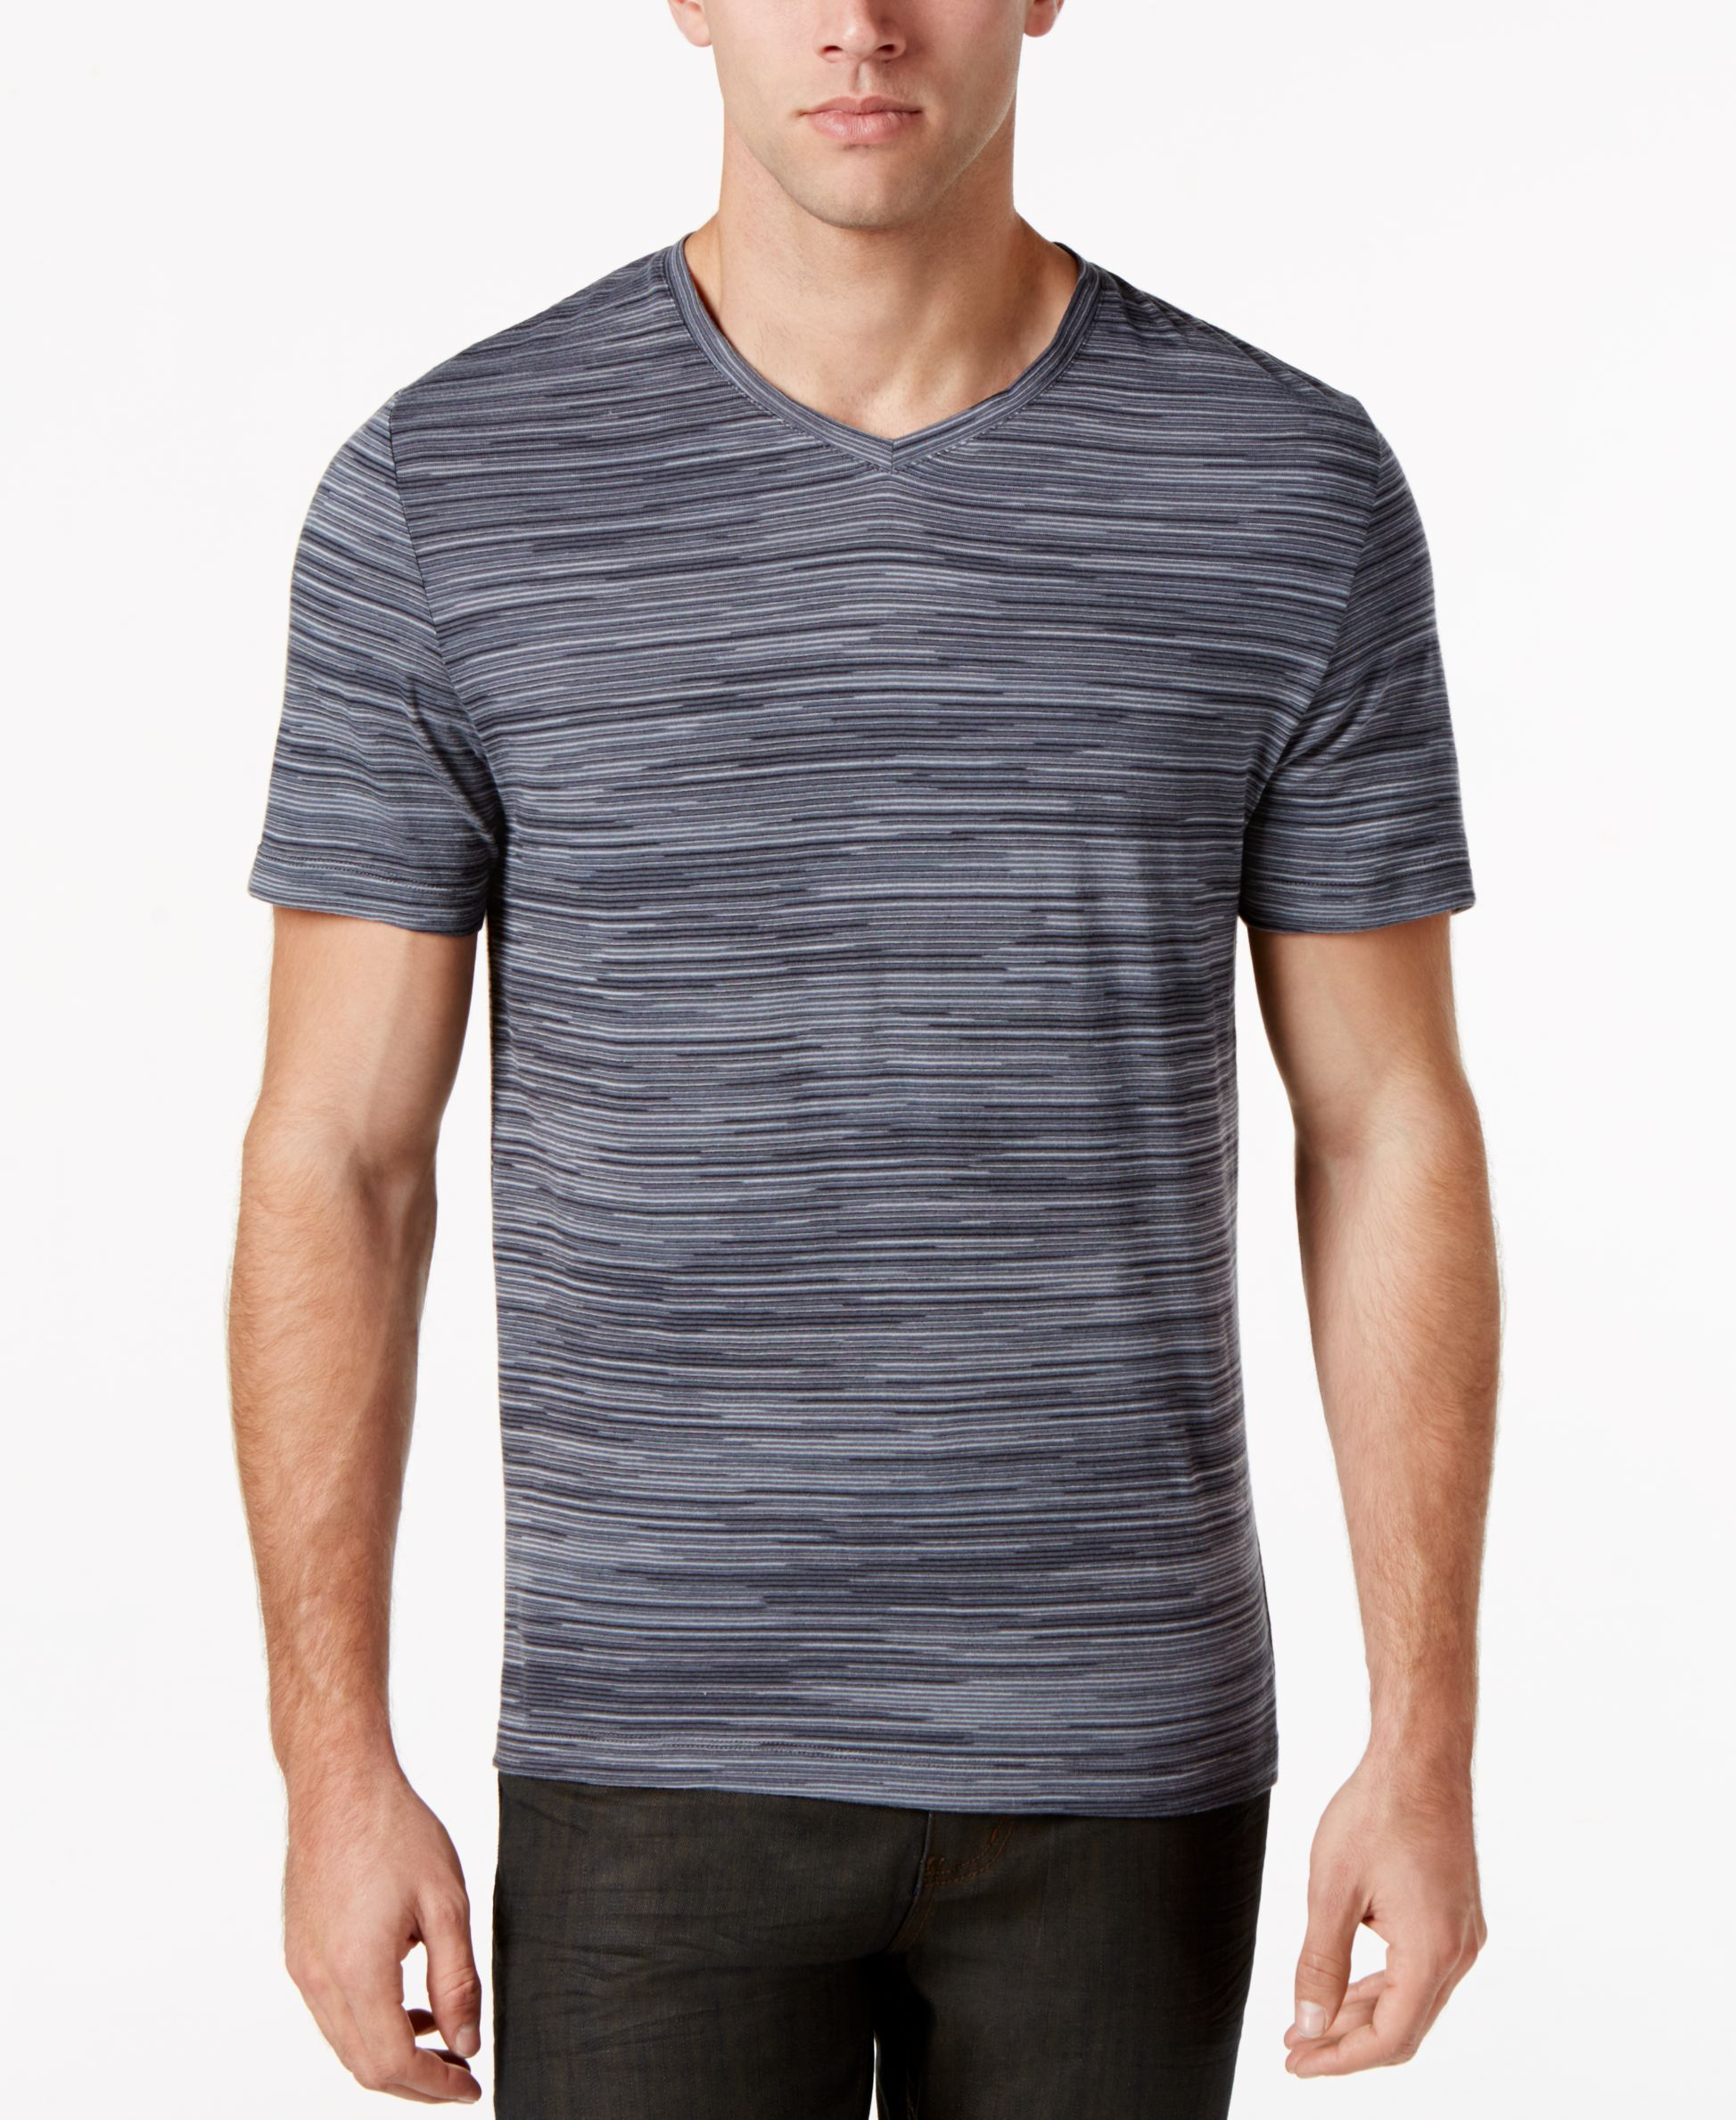 db4fb58382db Mens V Neck T Shirts At Macys